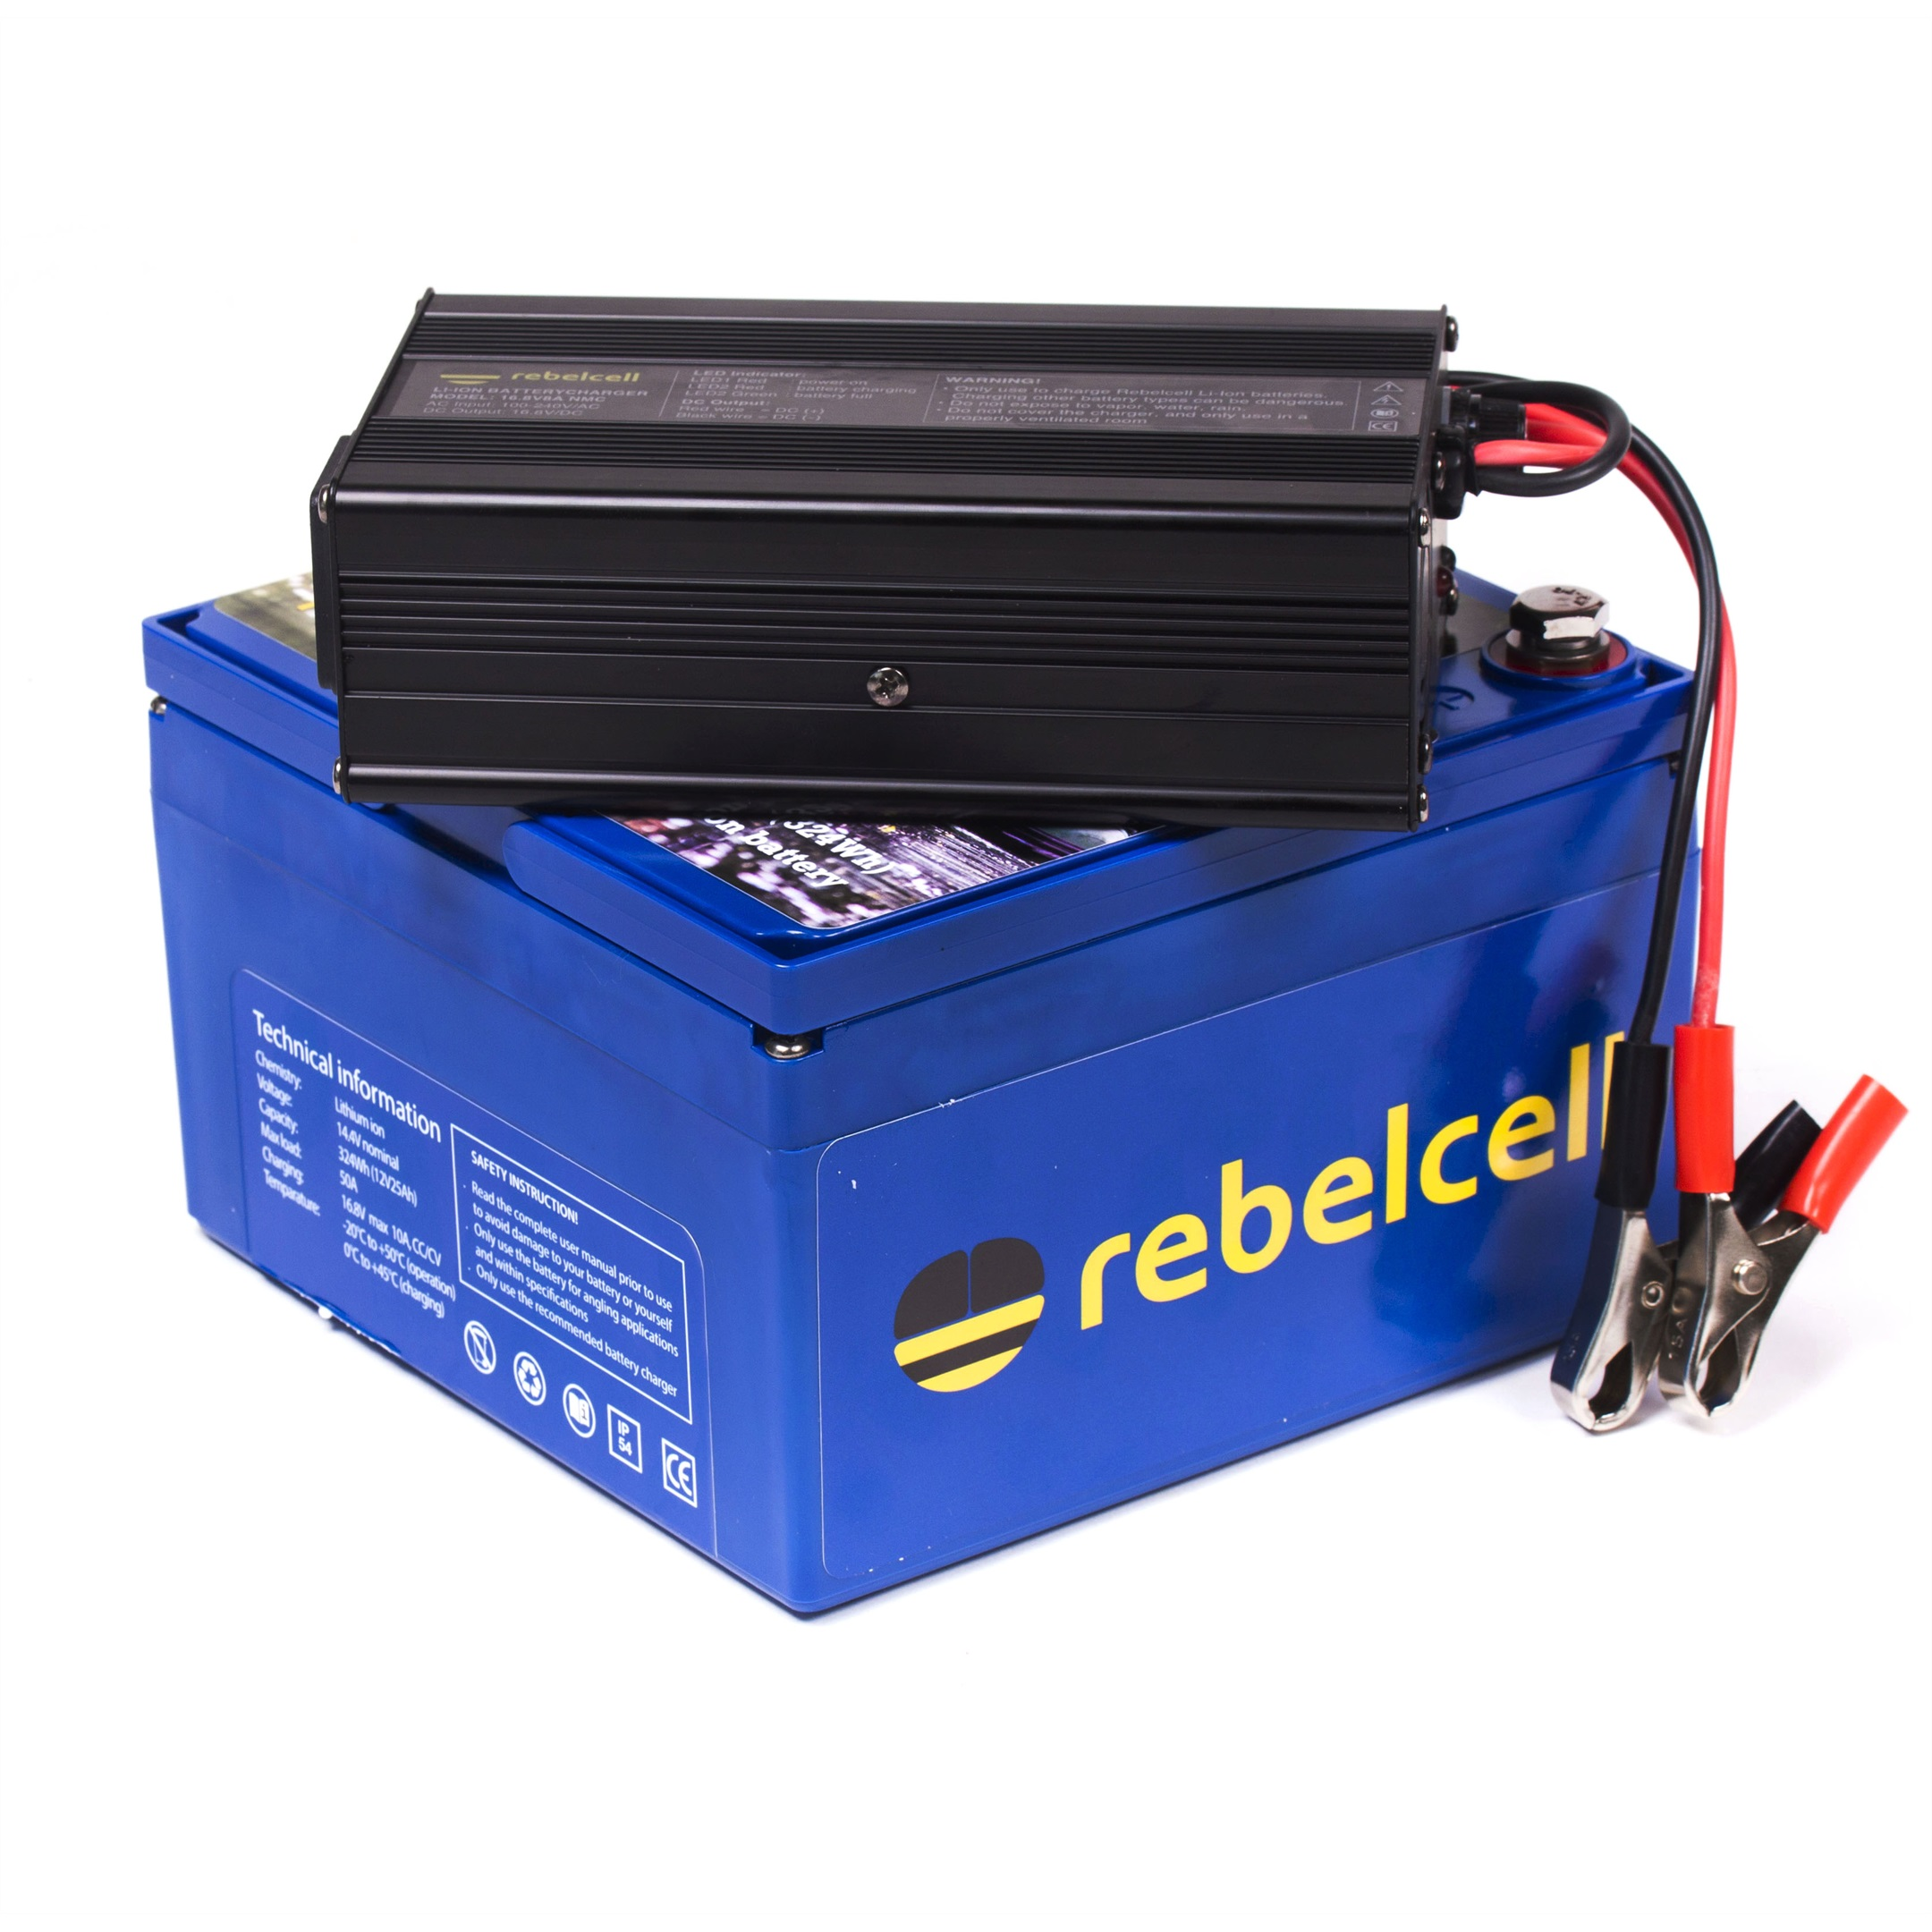 Rebelcell_Ultimate_Accu_Pakket